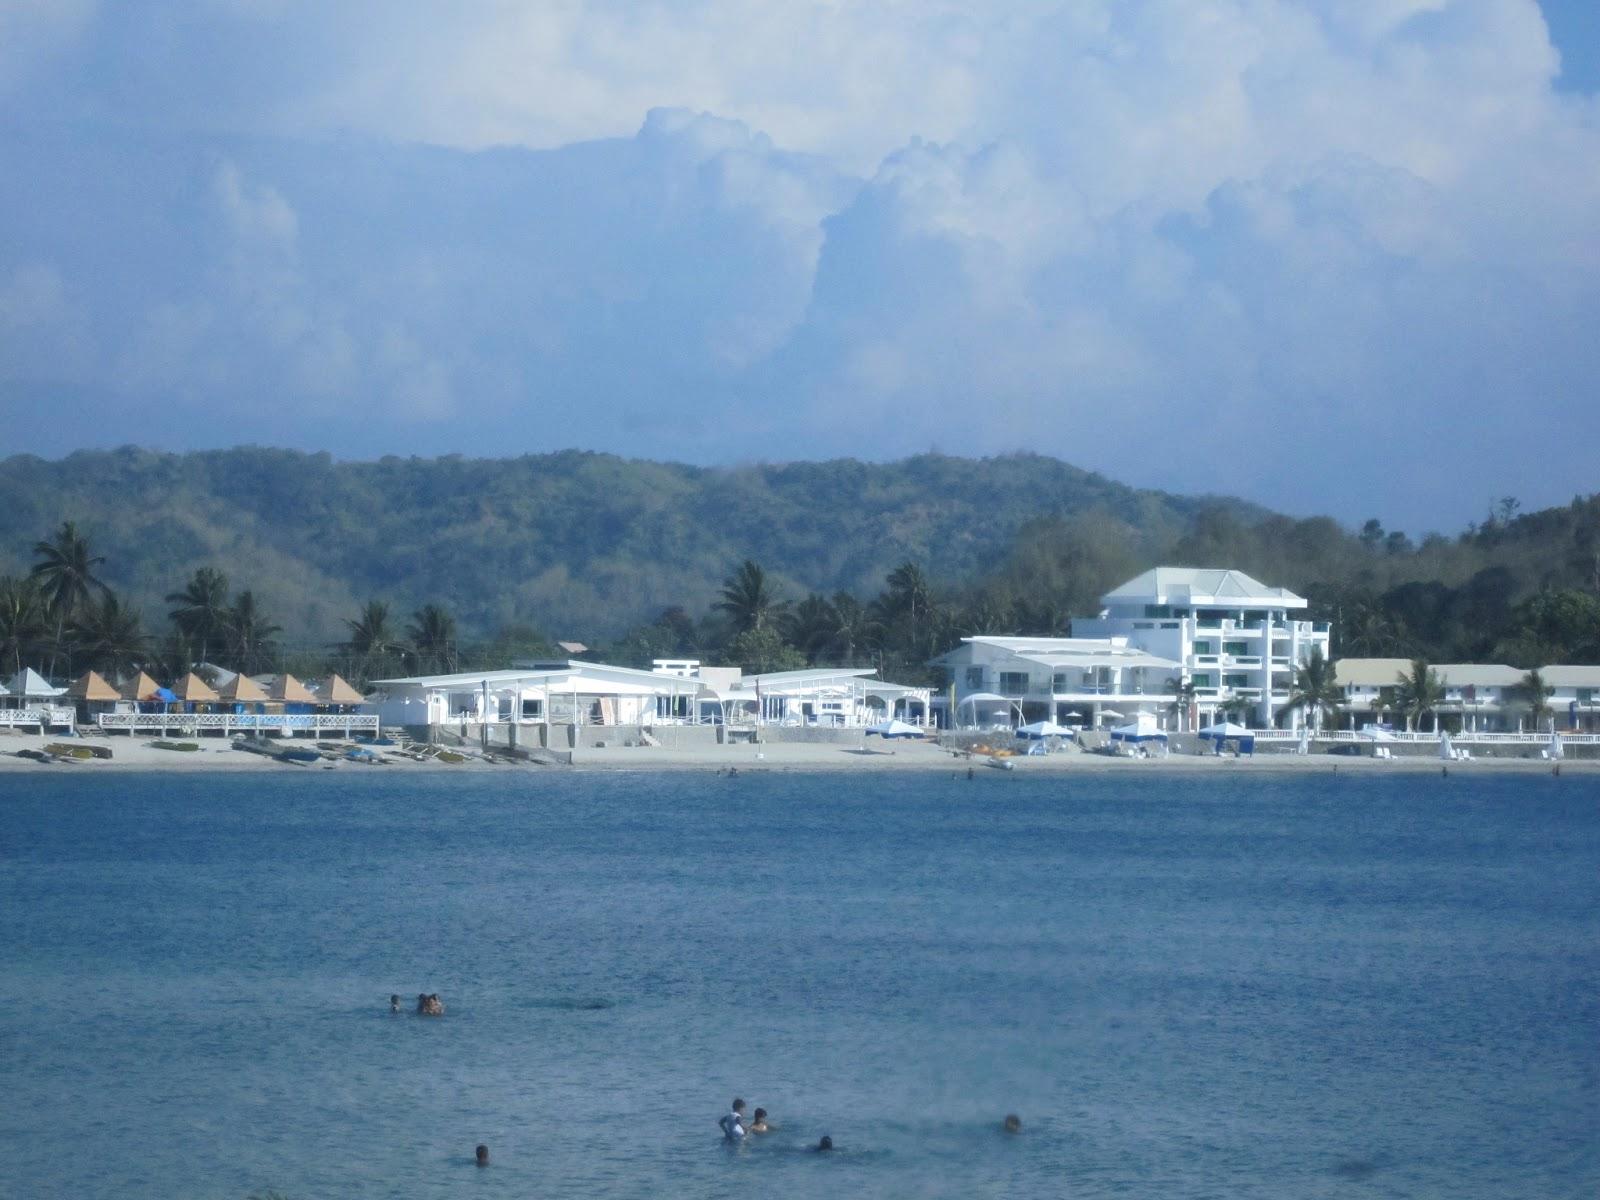 Santiago Cove And Beach In Brgy Sabangan Explore Ilocos